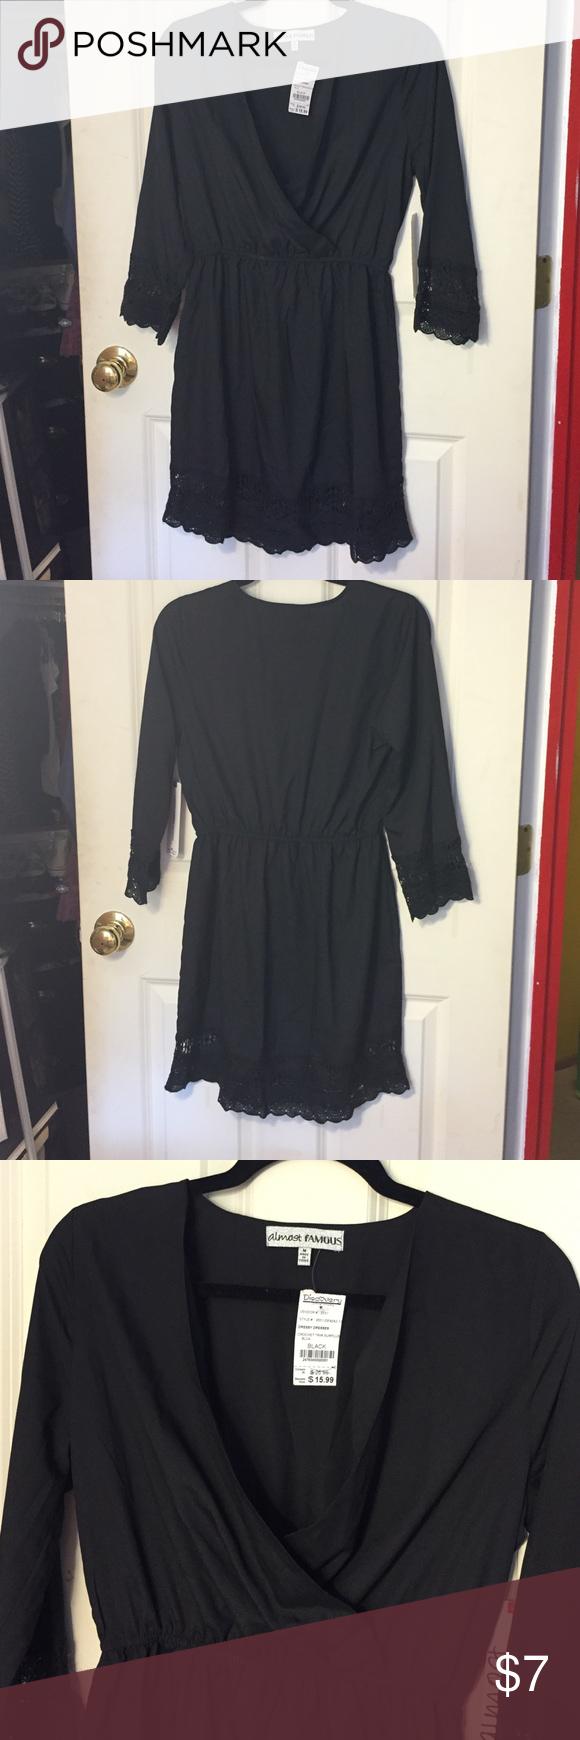 Black crochet hem dress black wrap dress with crochet lace sleeves